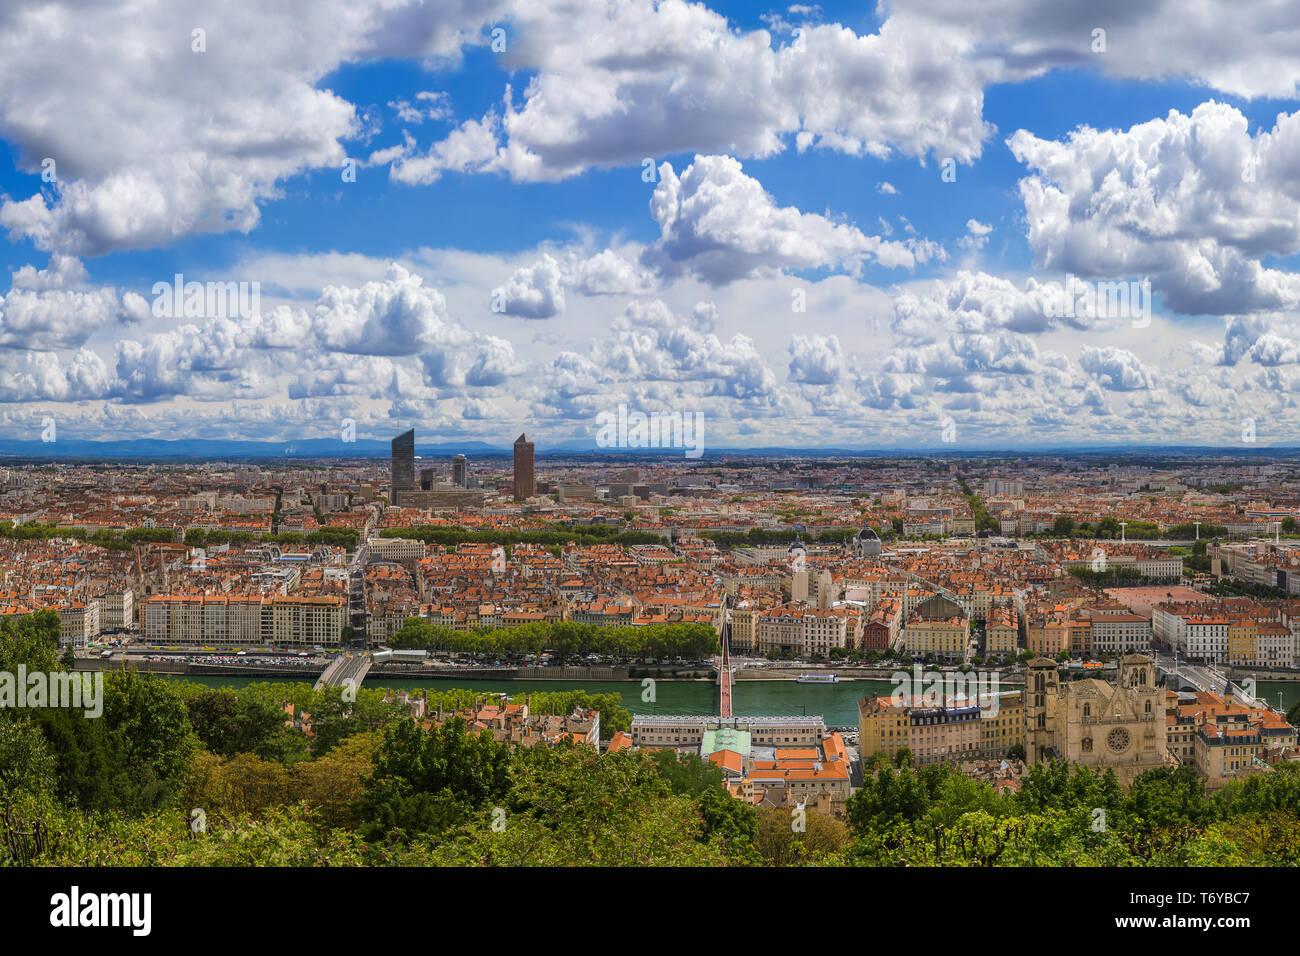 Panorama of Lyon - France - Stock Image